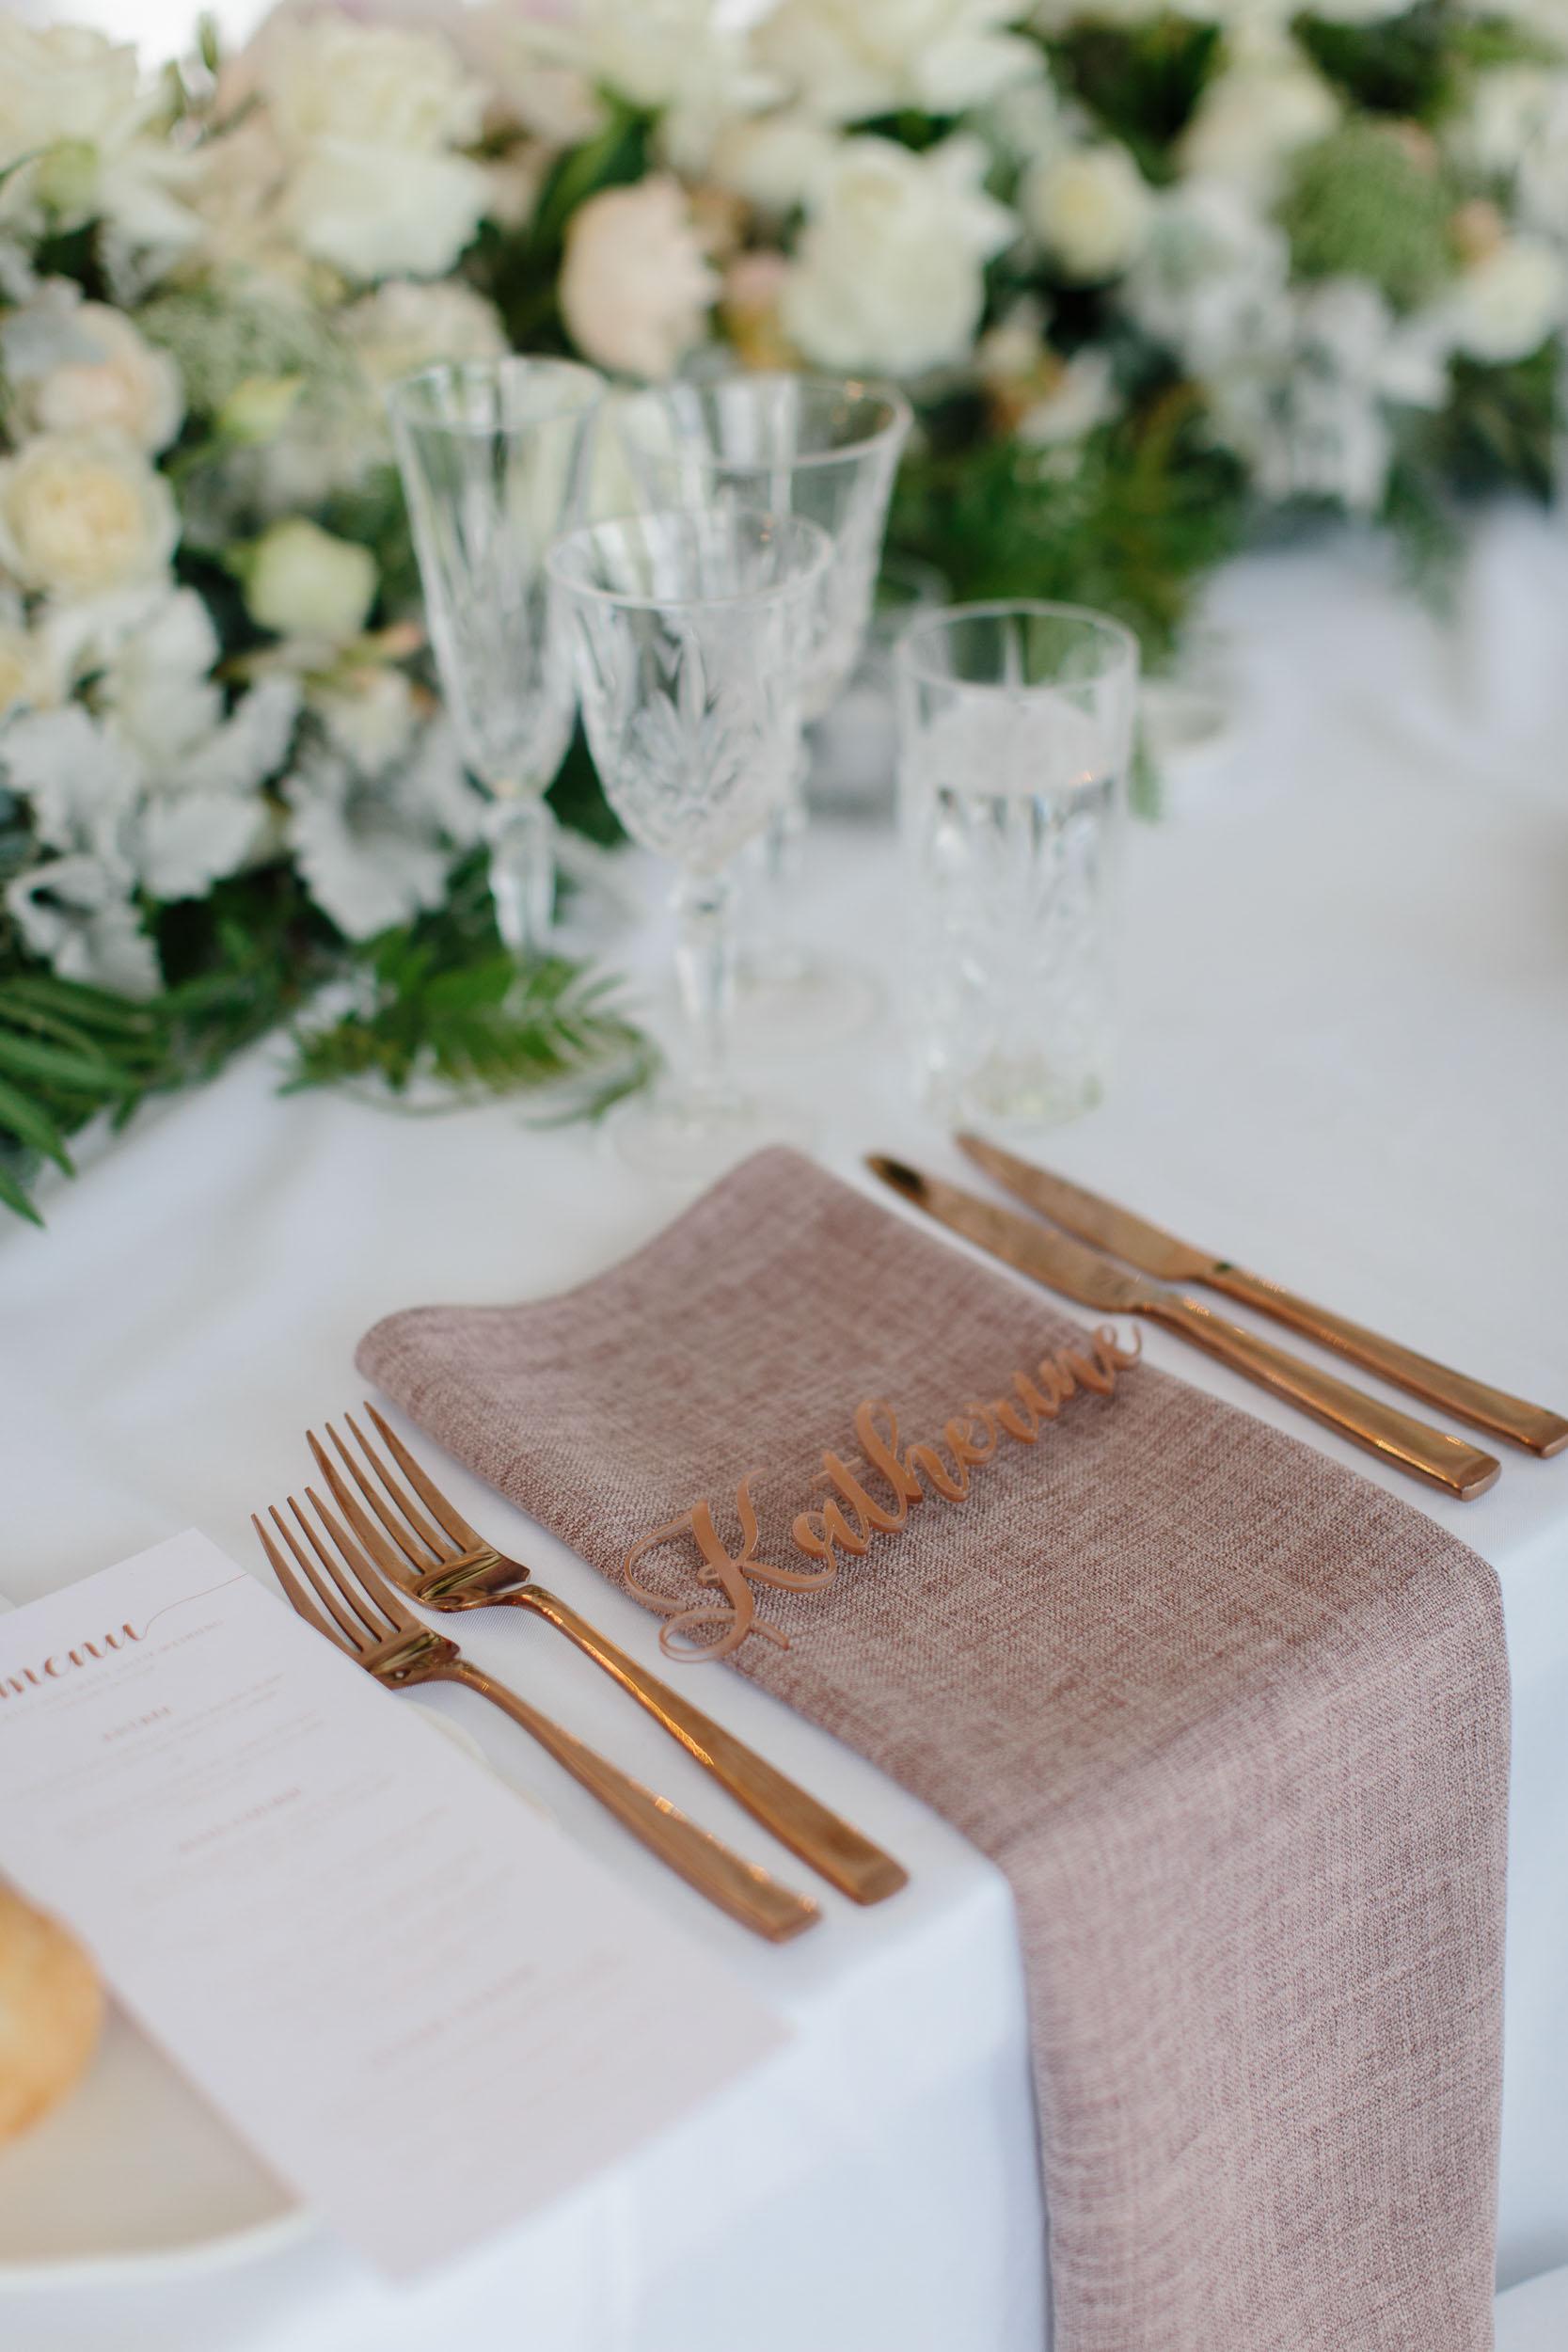 Kas-Richards-Mornington-Peninsula-Private-Property-Wedding-Marianna-Hardwick-Gown-540.jpg